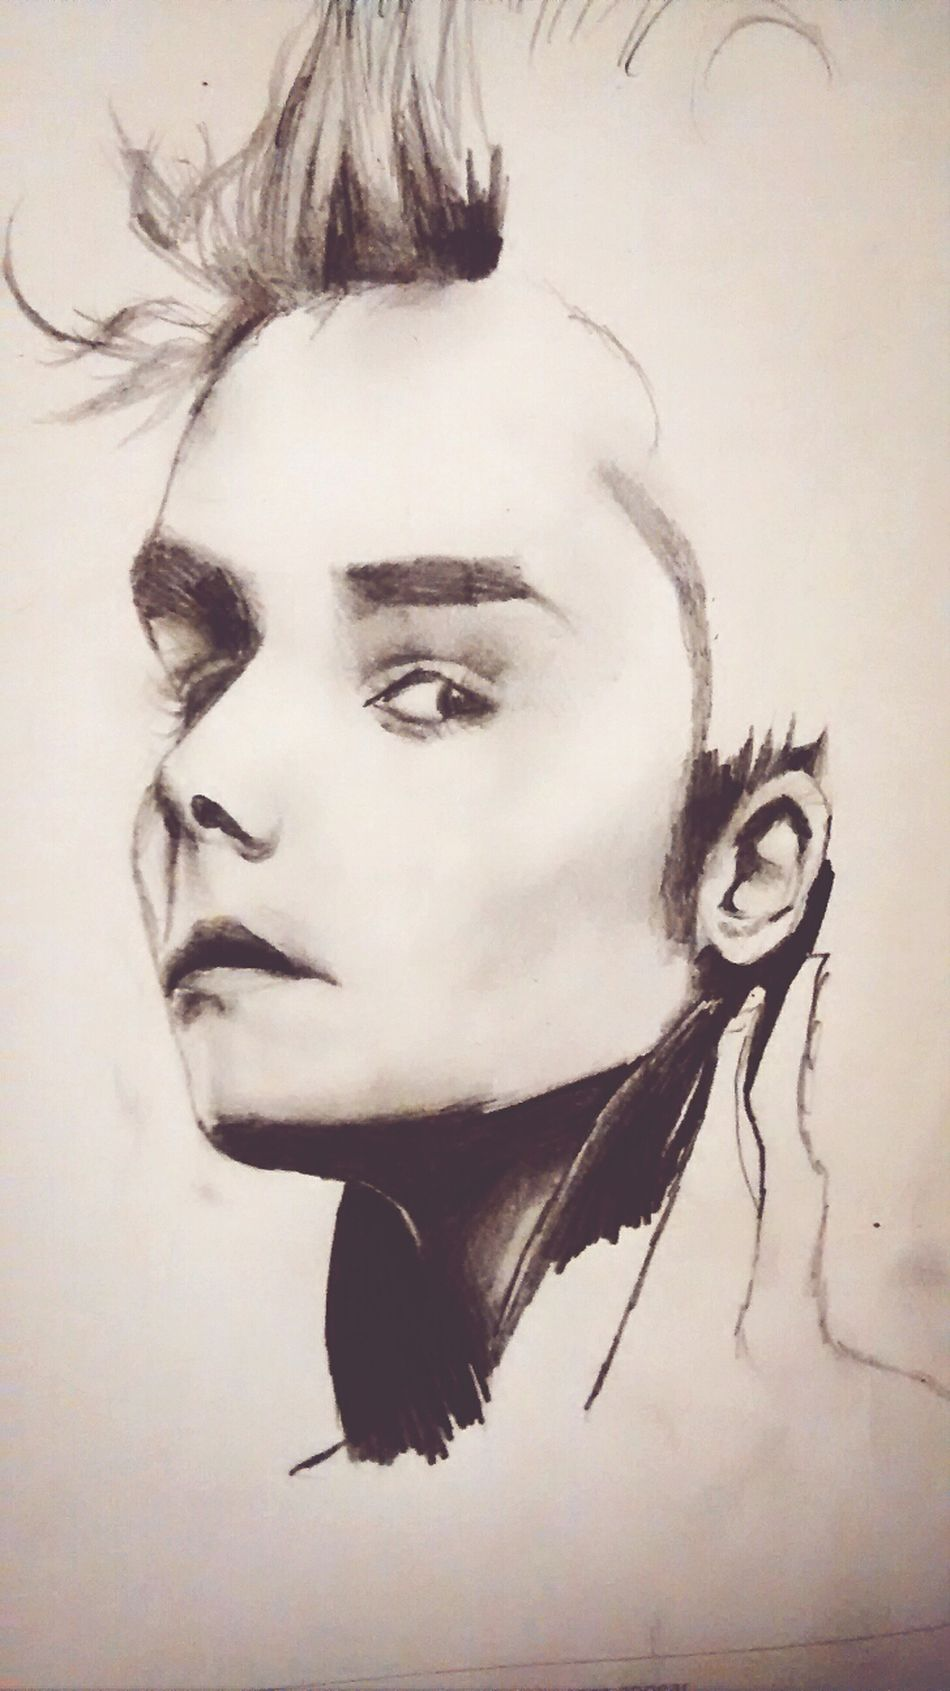 Gerard Way Musicians My Favourite Band. Work In Progress Art